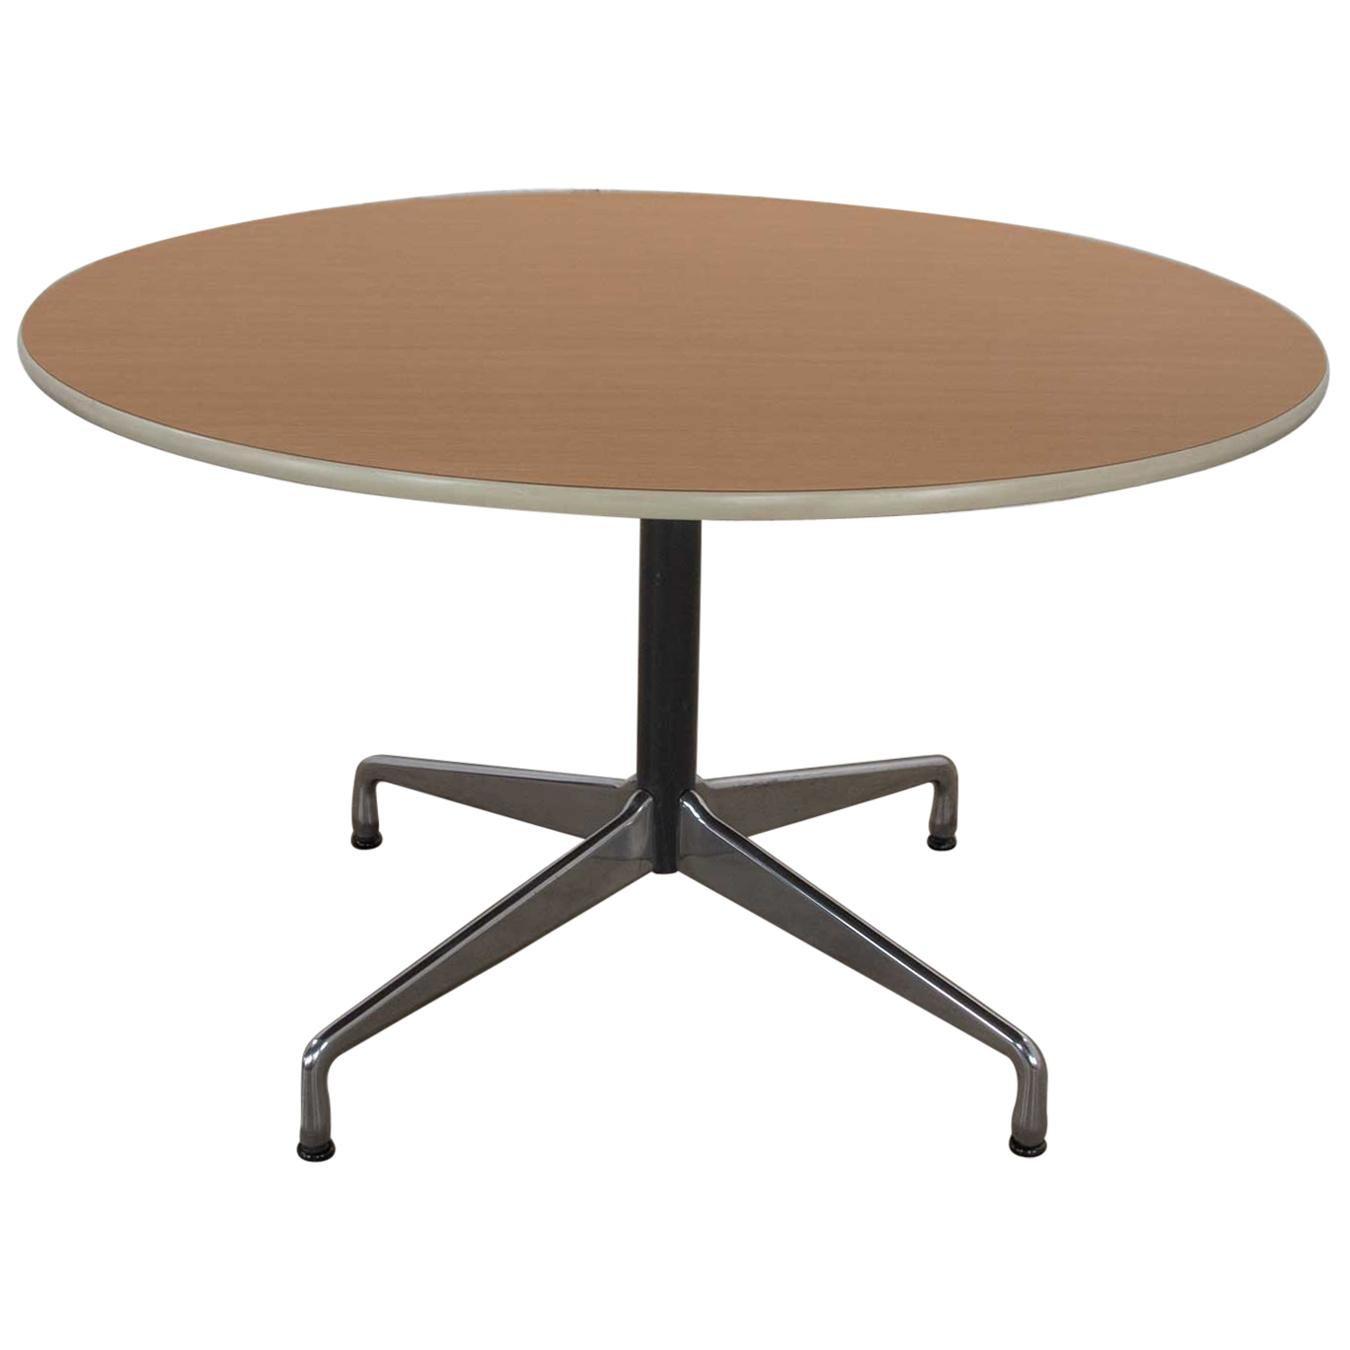 Eames Herman Miller Round Table Universal Base Wood Grain Laminate Top